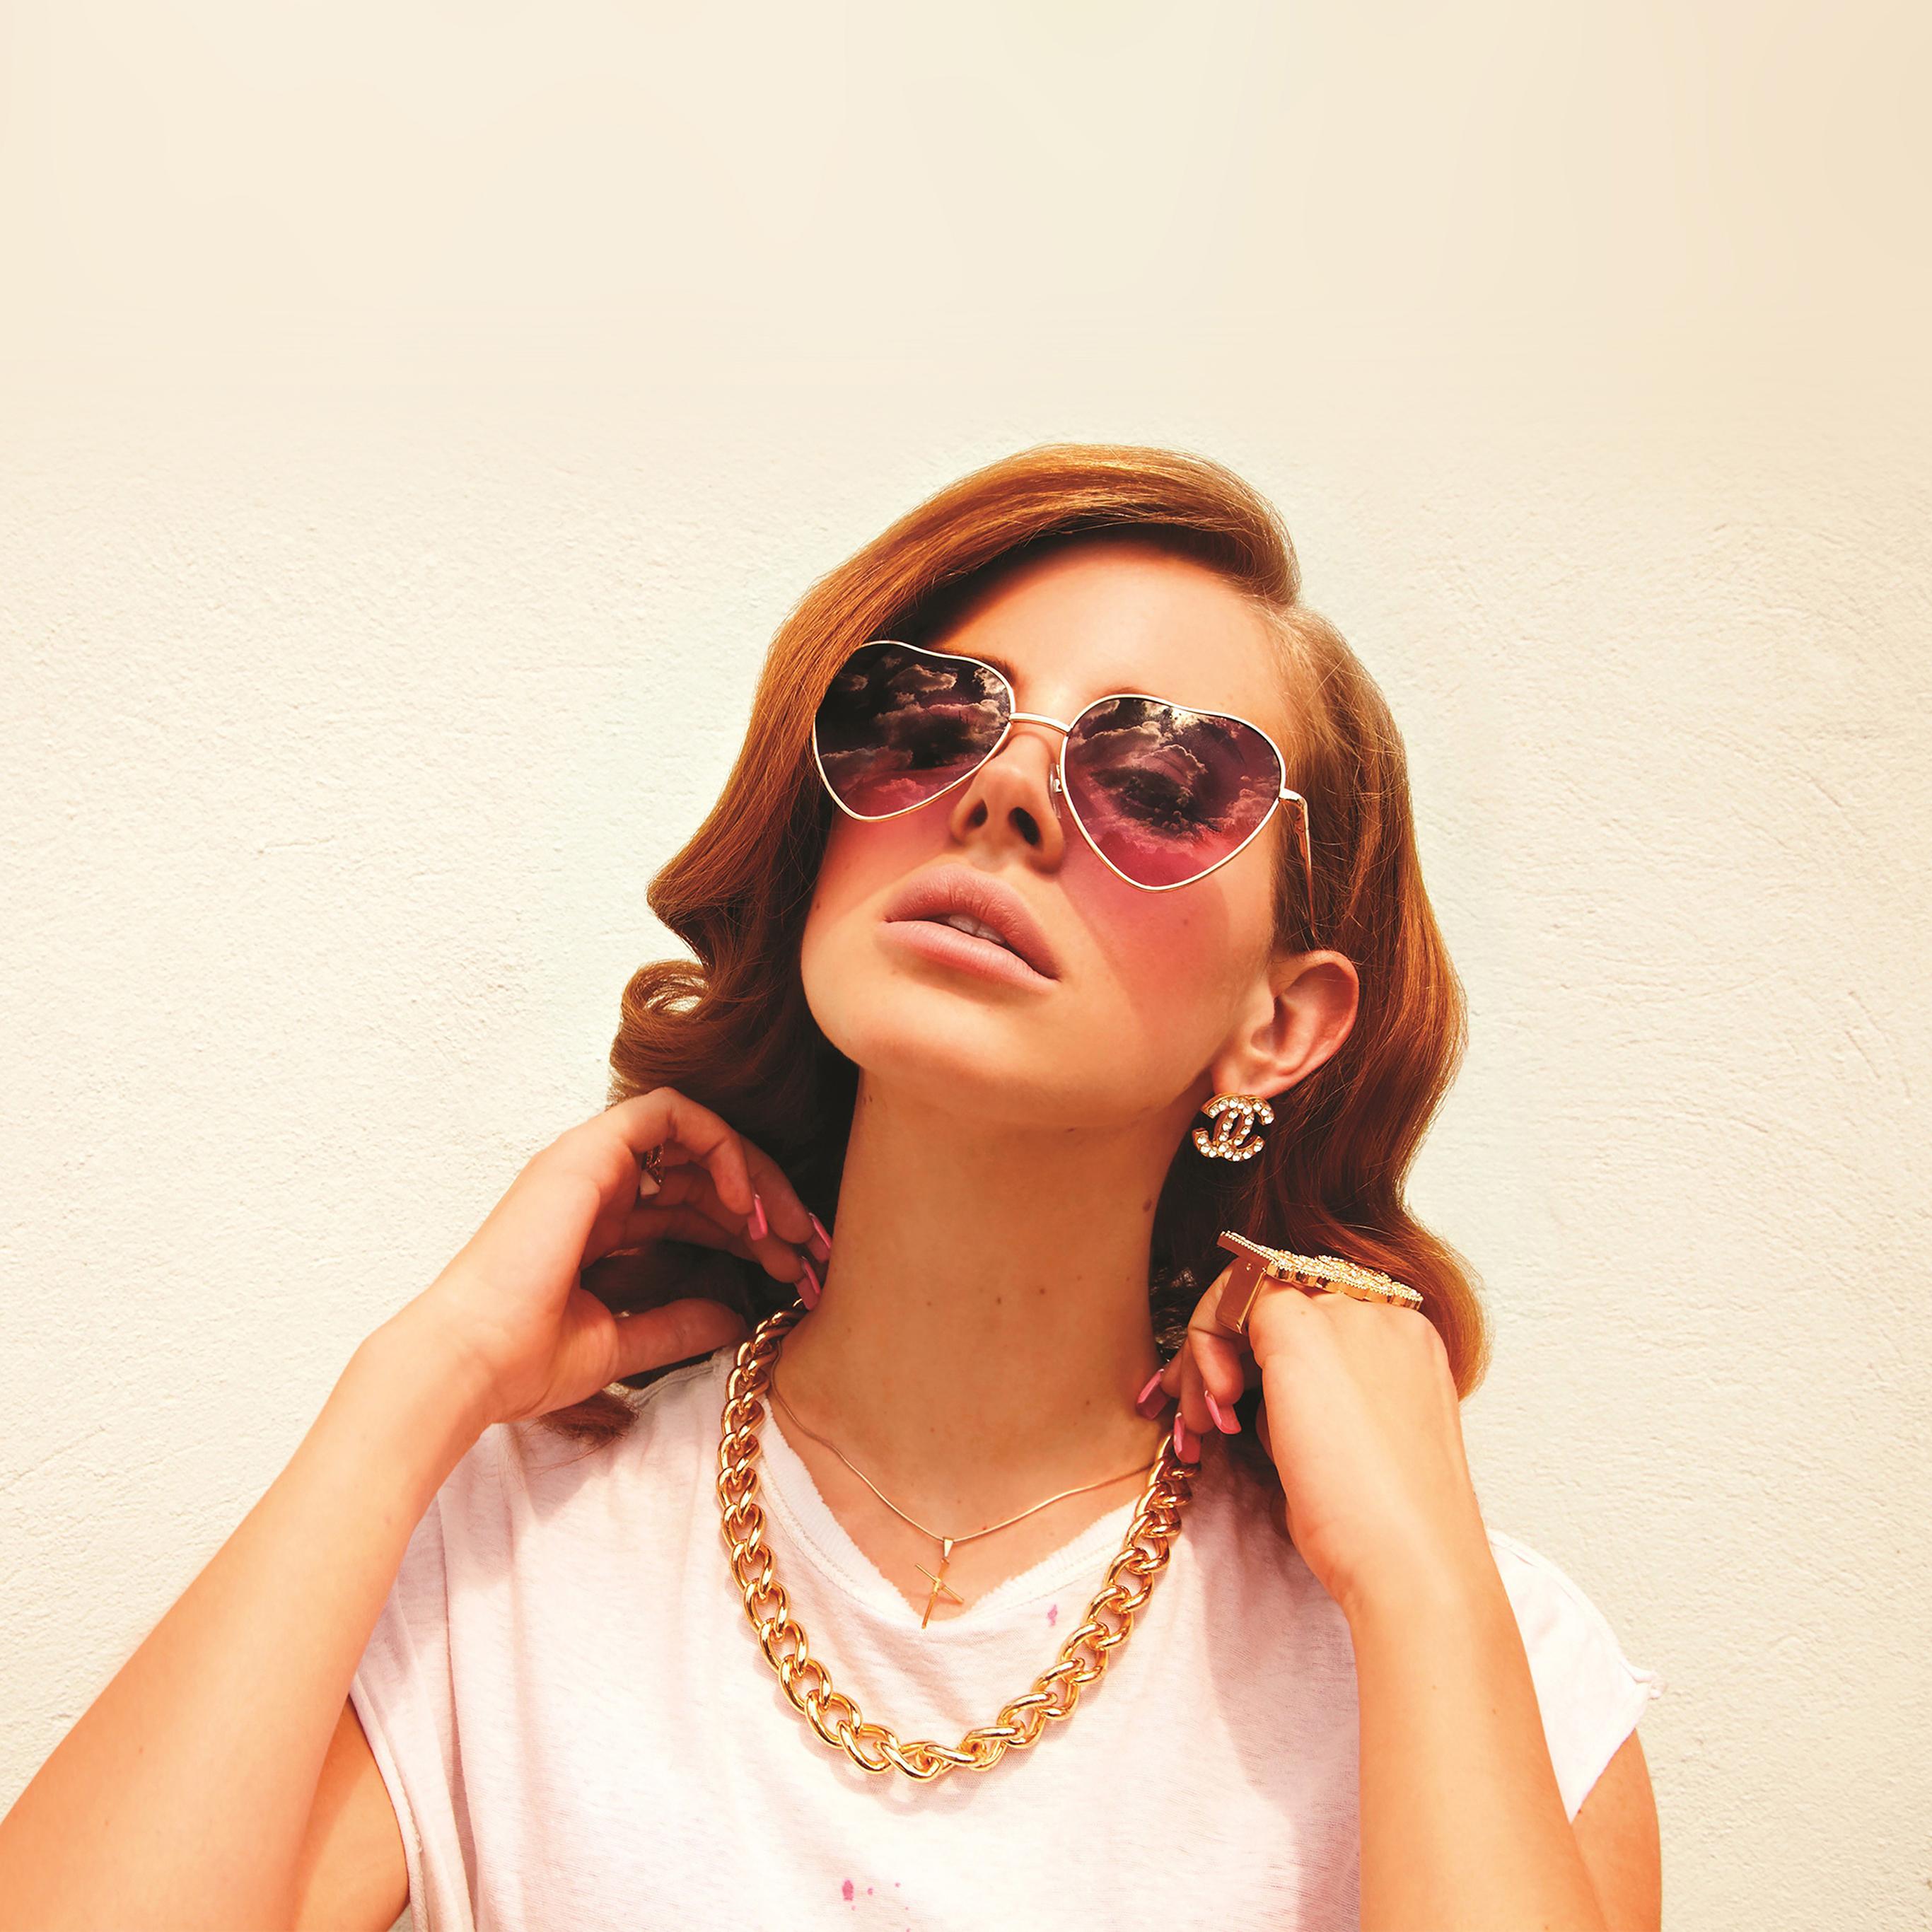 I Love Papers Hd09 Lana Del Rey Music Singer Celebrity